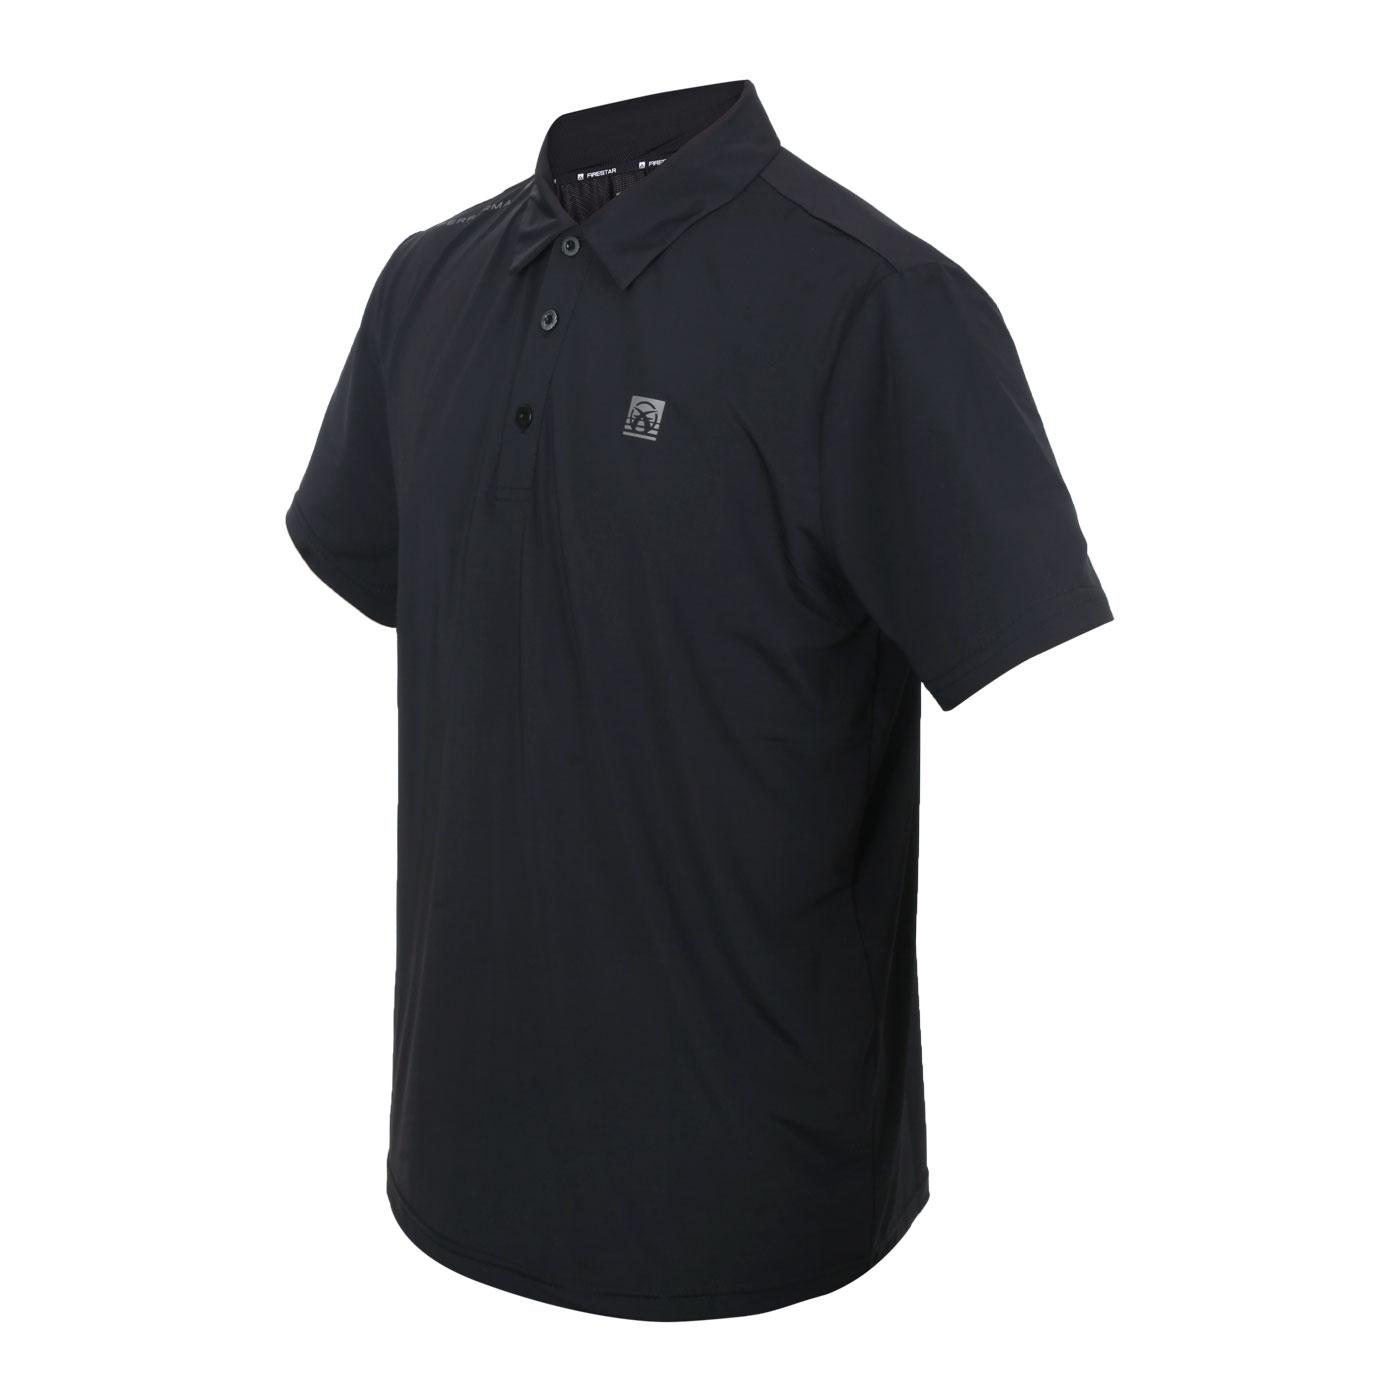 FIRESTAR 男款彈性高爾夫短袖POLO衫 D1752-10 - 黑銀